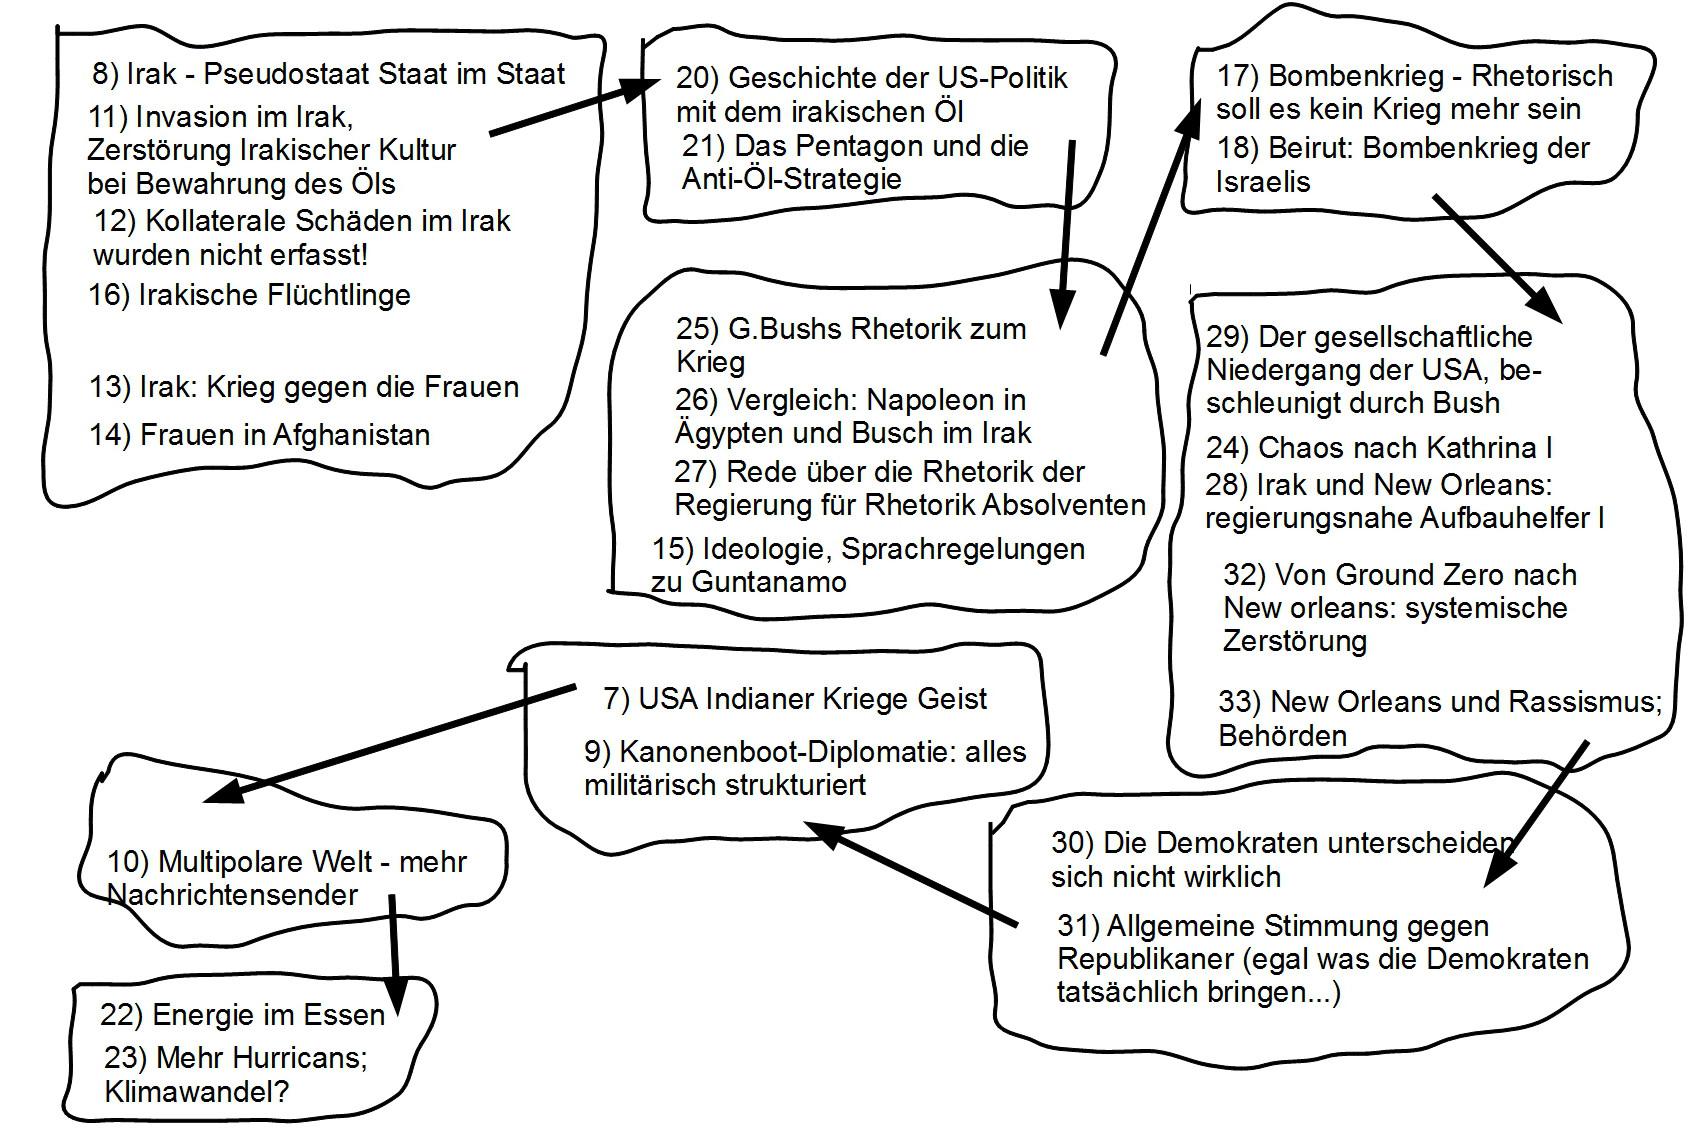 Themenlandkarte zu Engelhardt, Kap.8-33